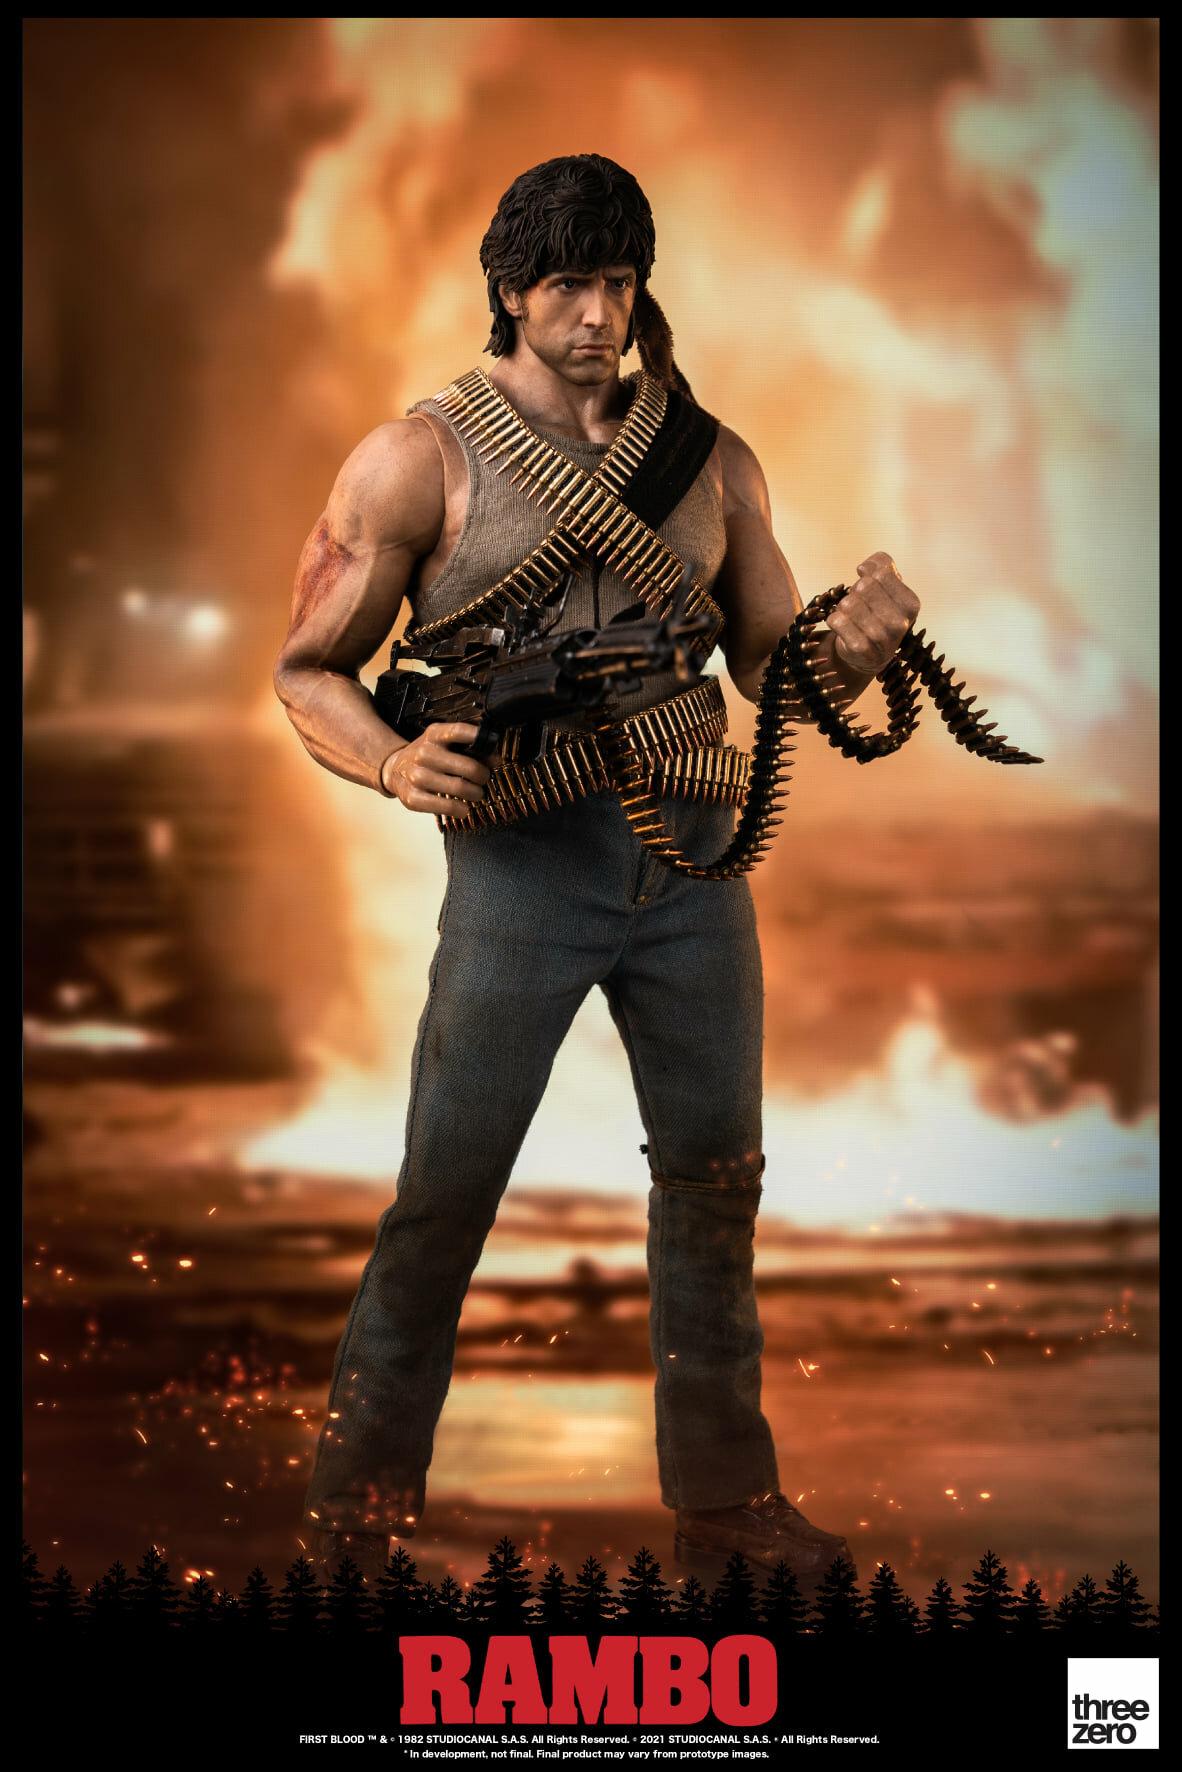 First-Blood-Rambo-ThreeZero-Preview.jpg